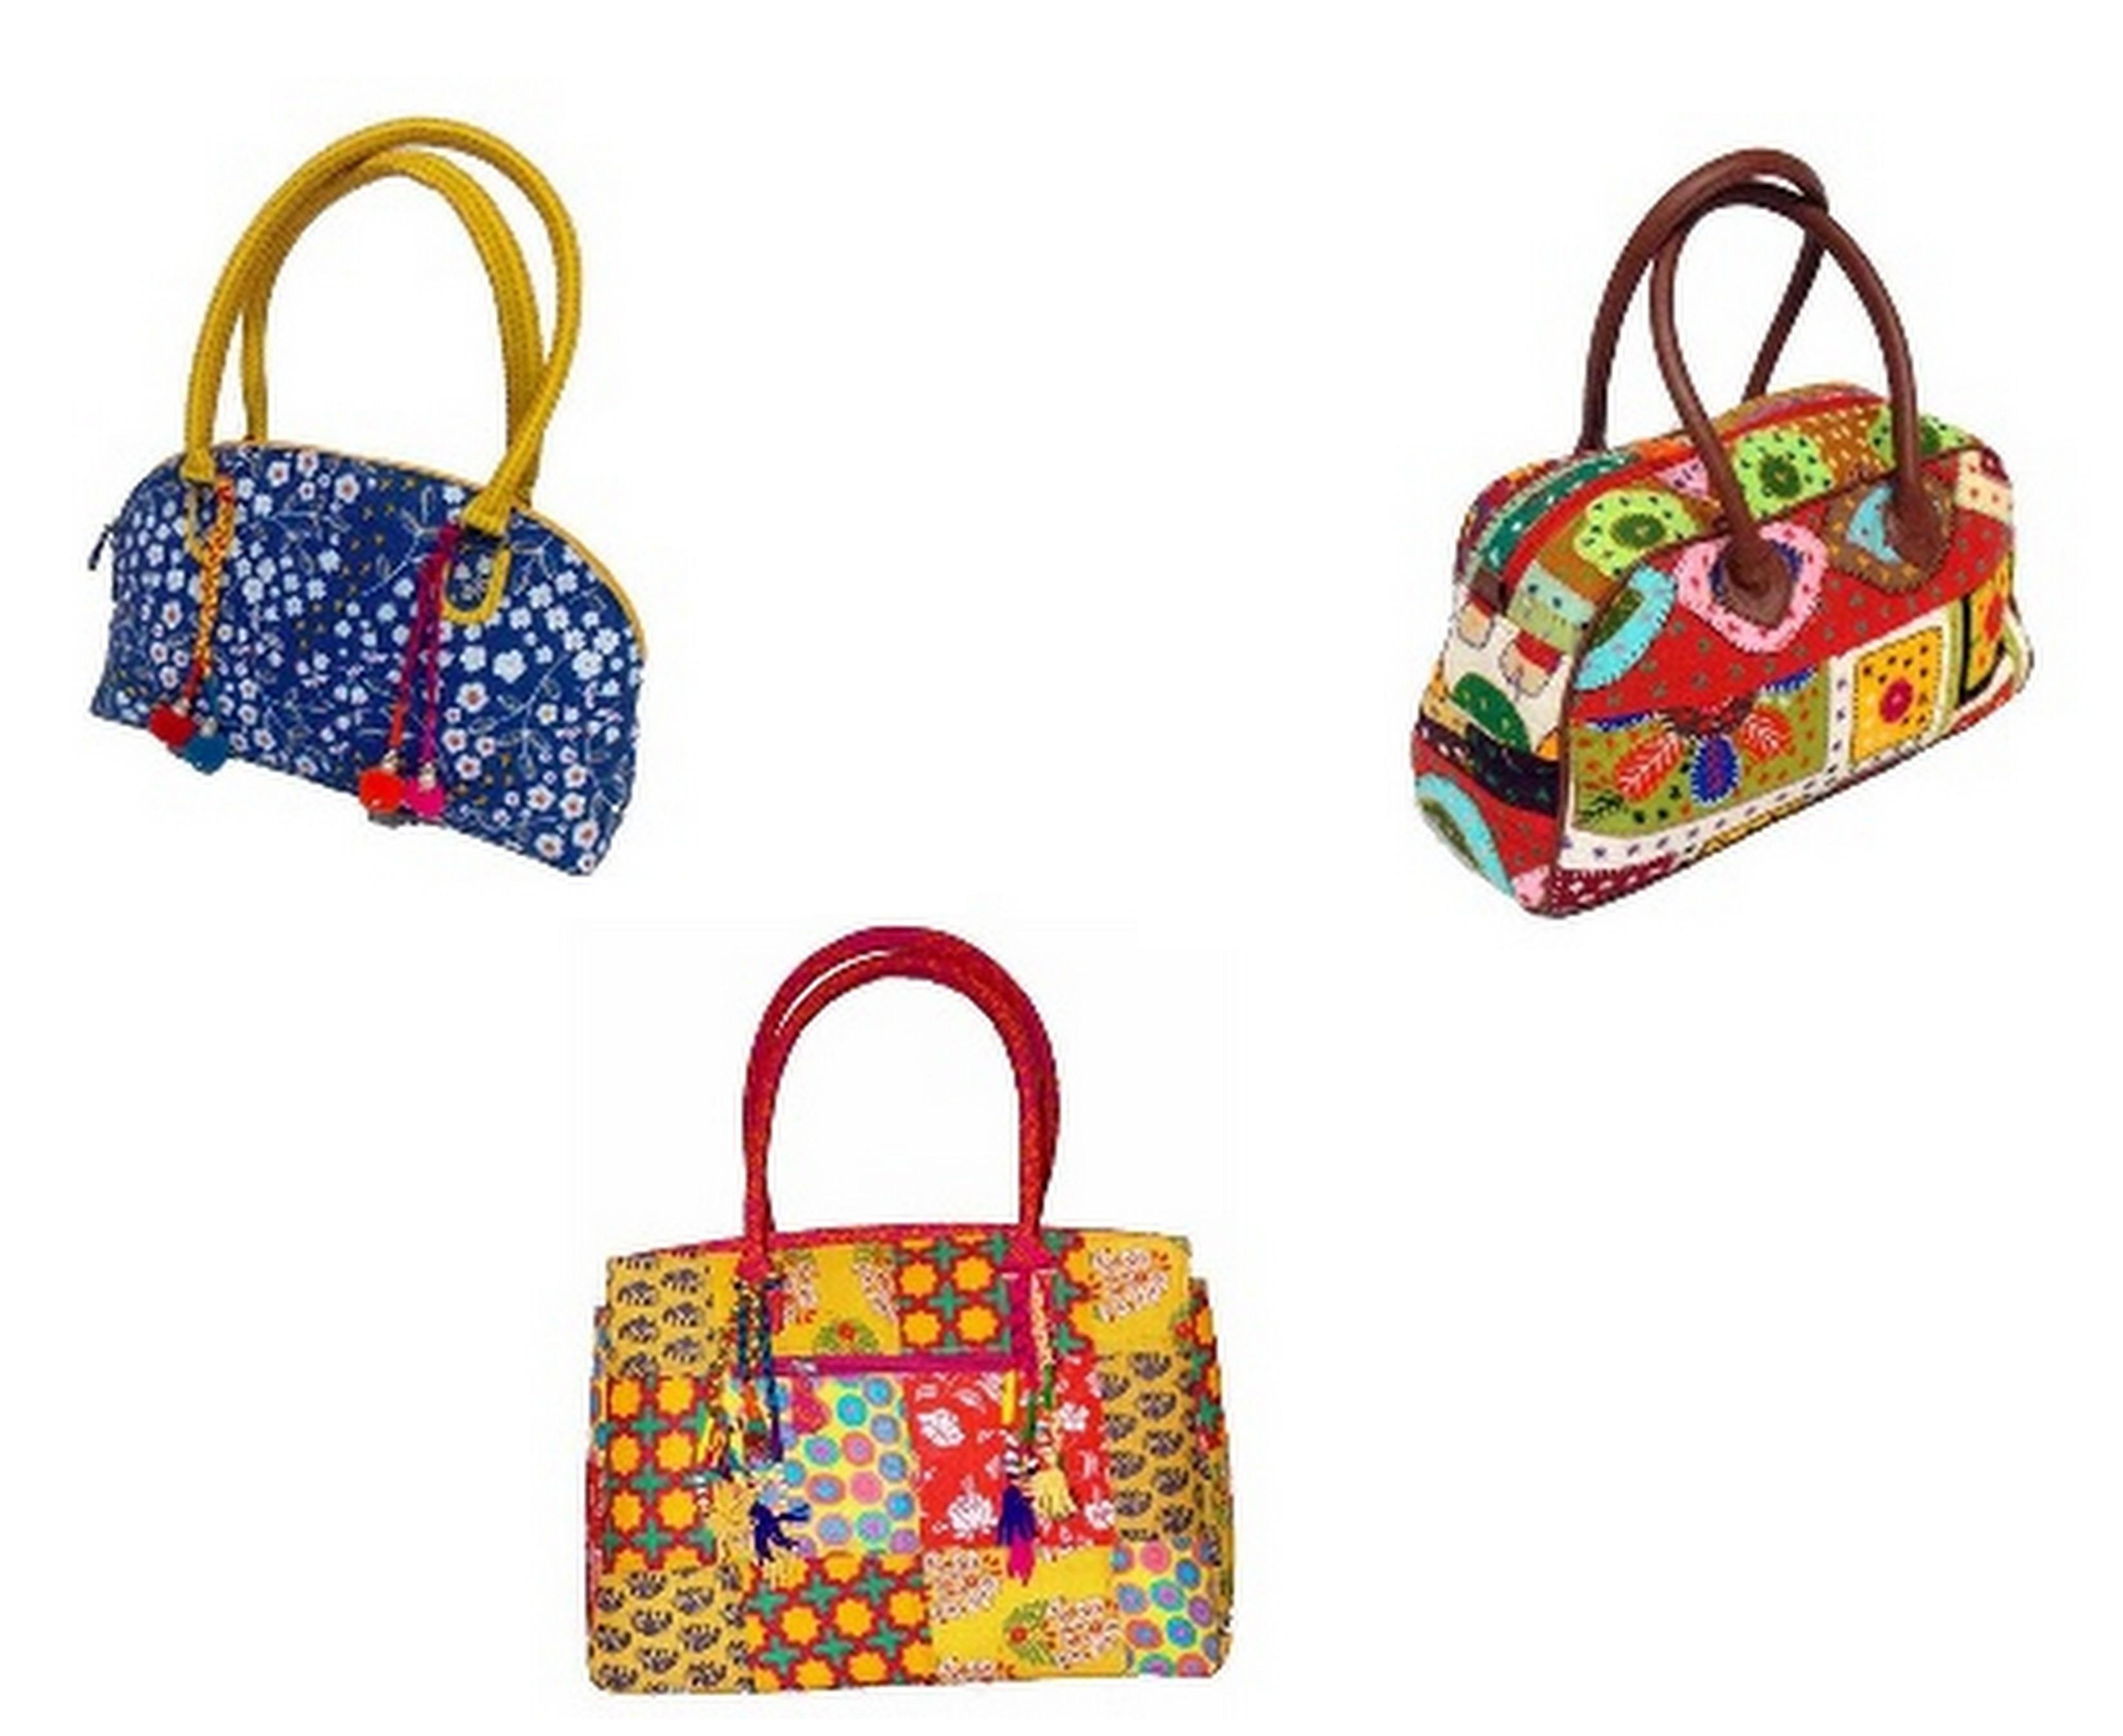 5 Types Of Wholesale Designer Handbags To Compliment Women ...